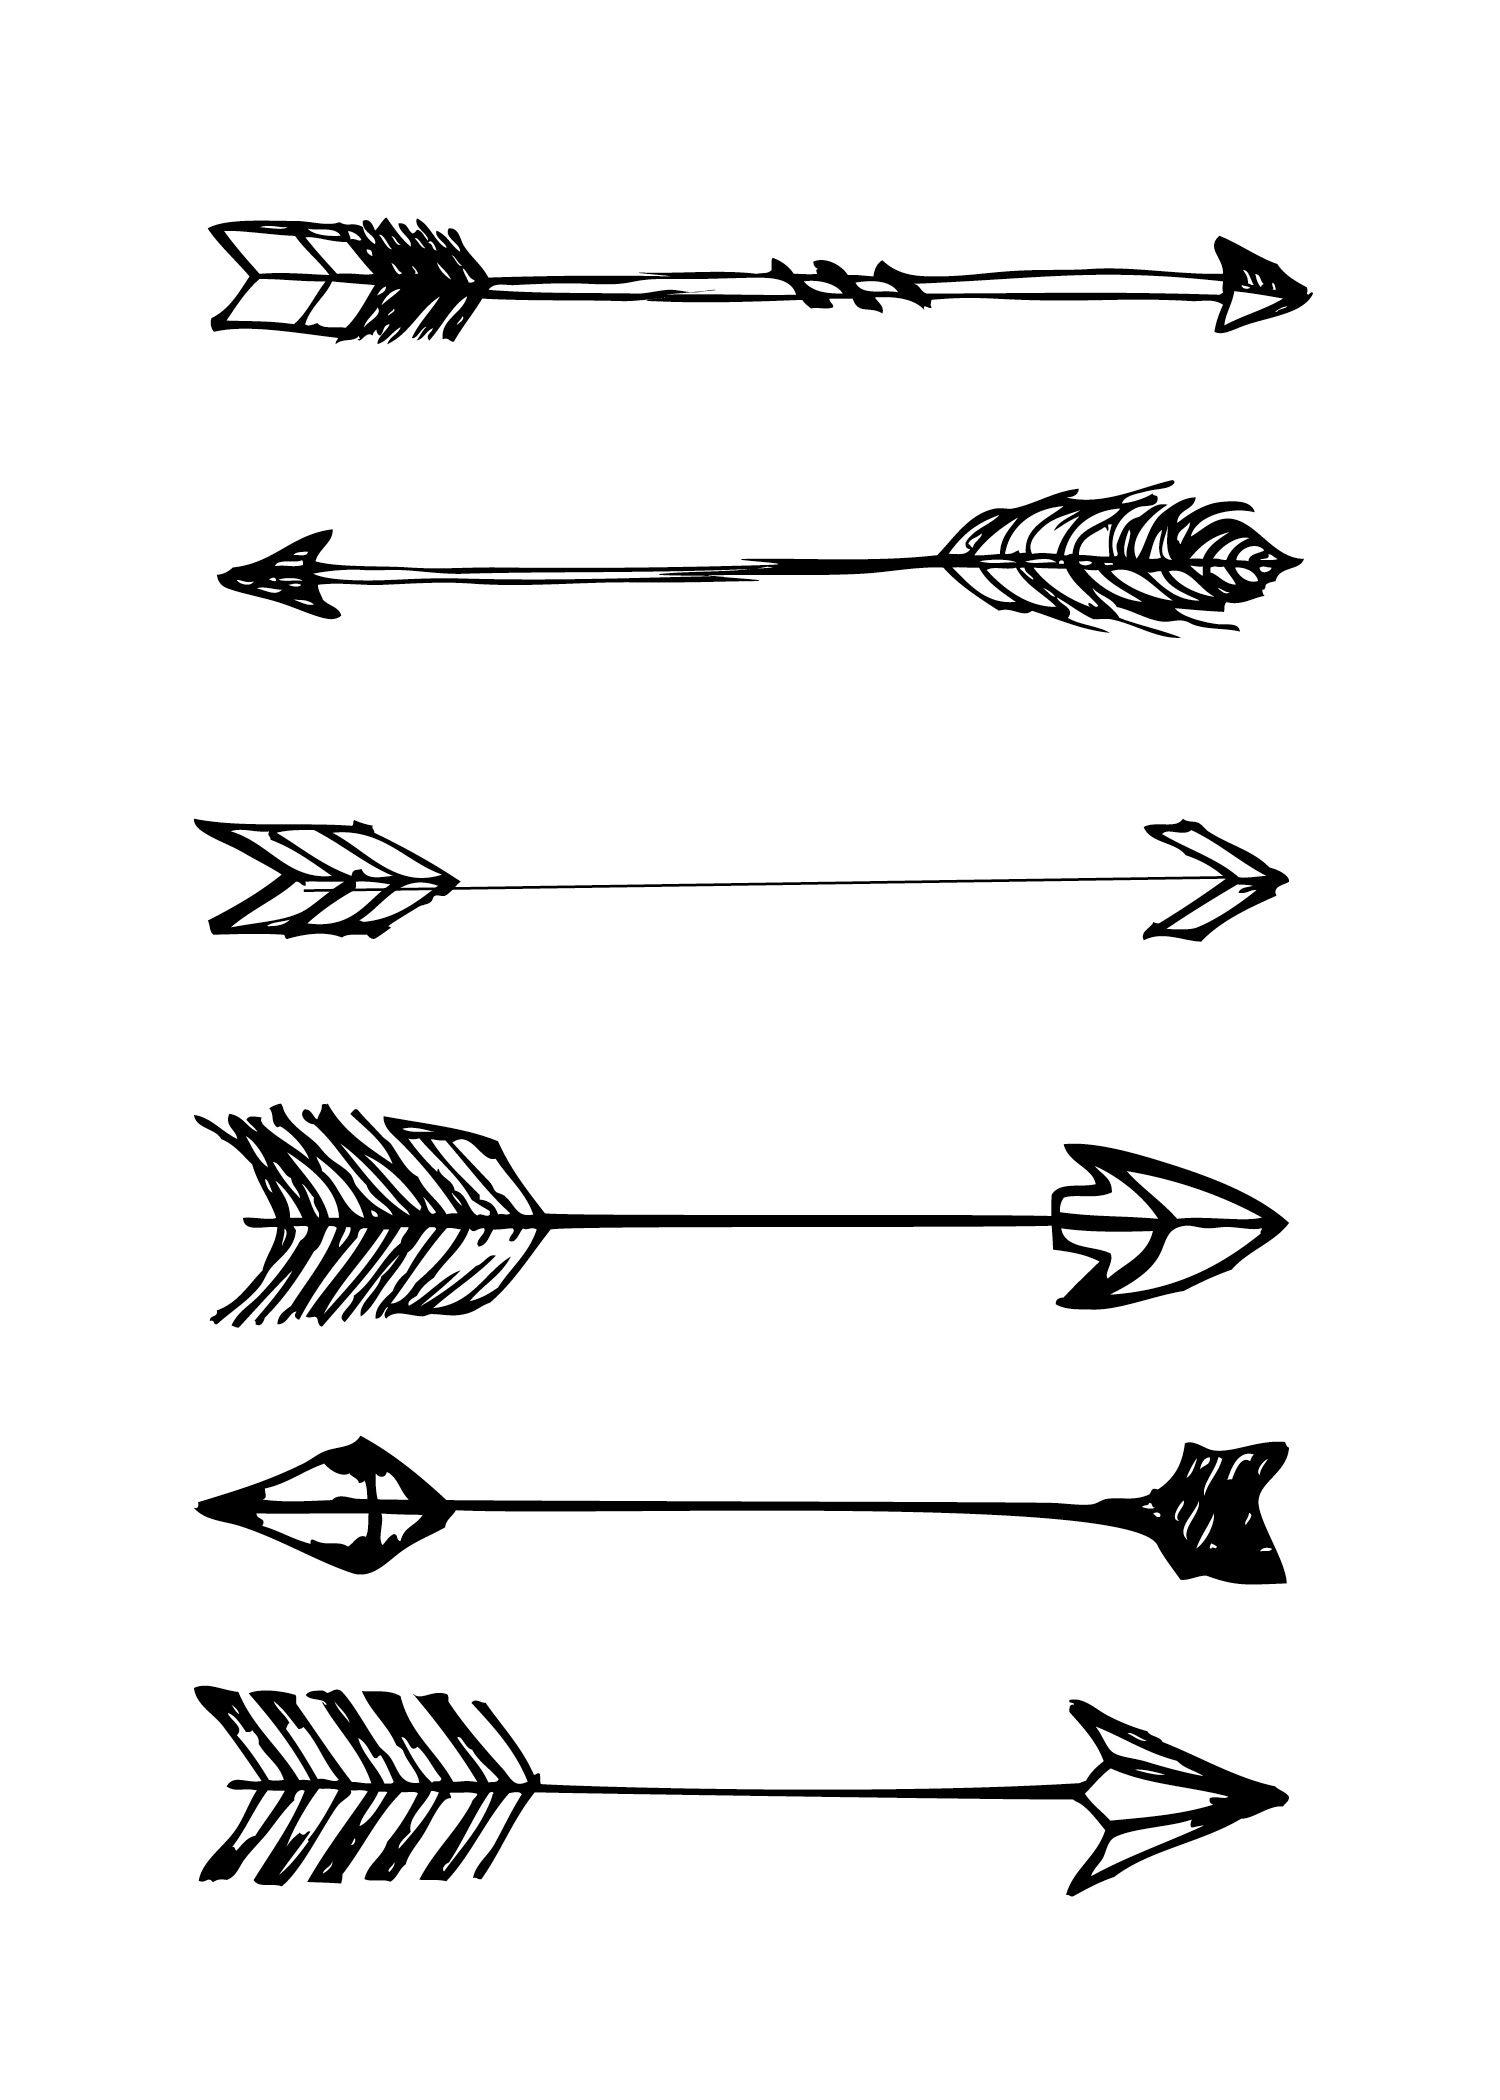 Free Printables | Printables - Wallpaper, Arrow Tattoos En Art - Free Black And White Printable Art